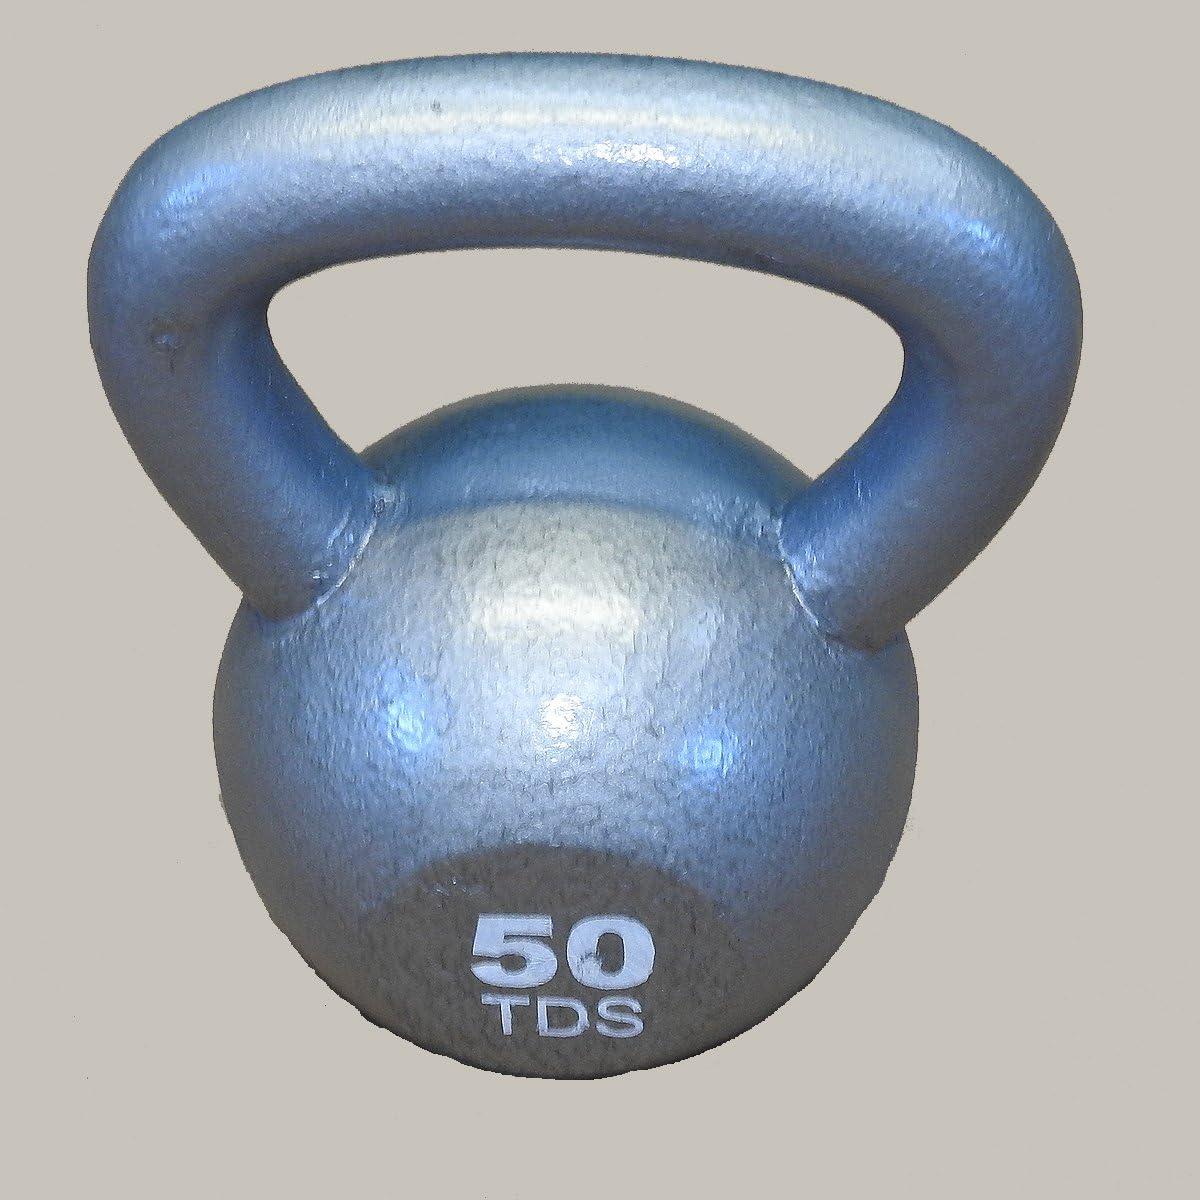 TDS 50 lb. Wide Handle Kettlebell